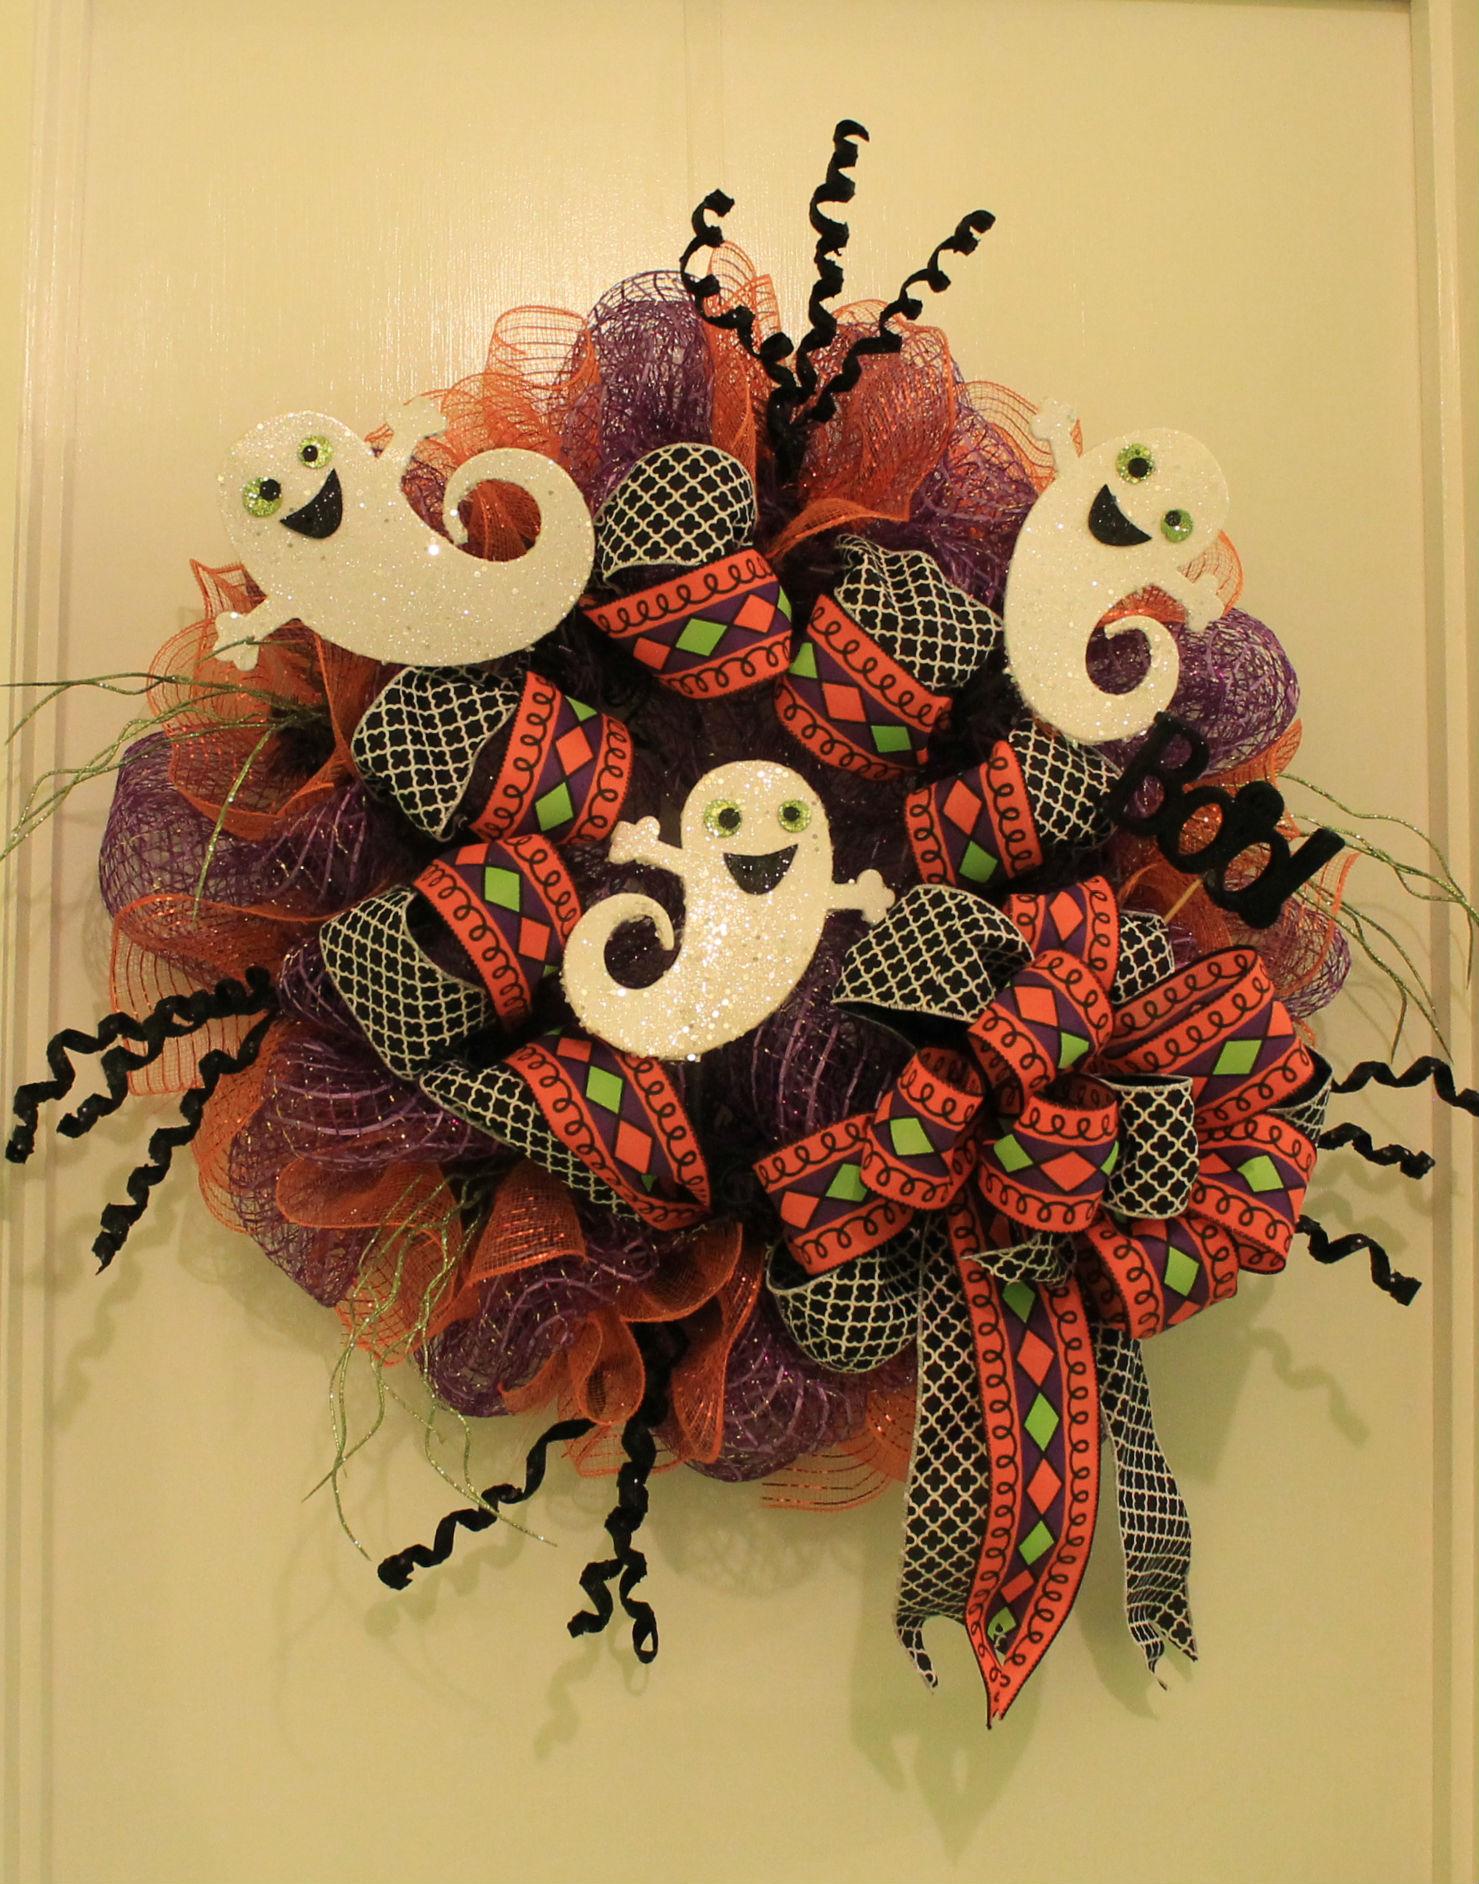 Diy Dancing Ghost Deco Mesh Wreath The Wreath Depot